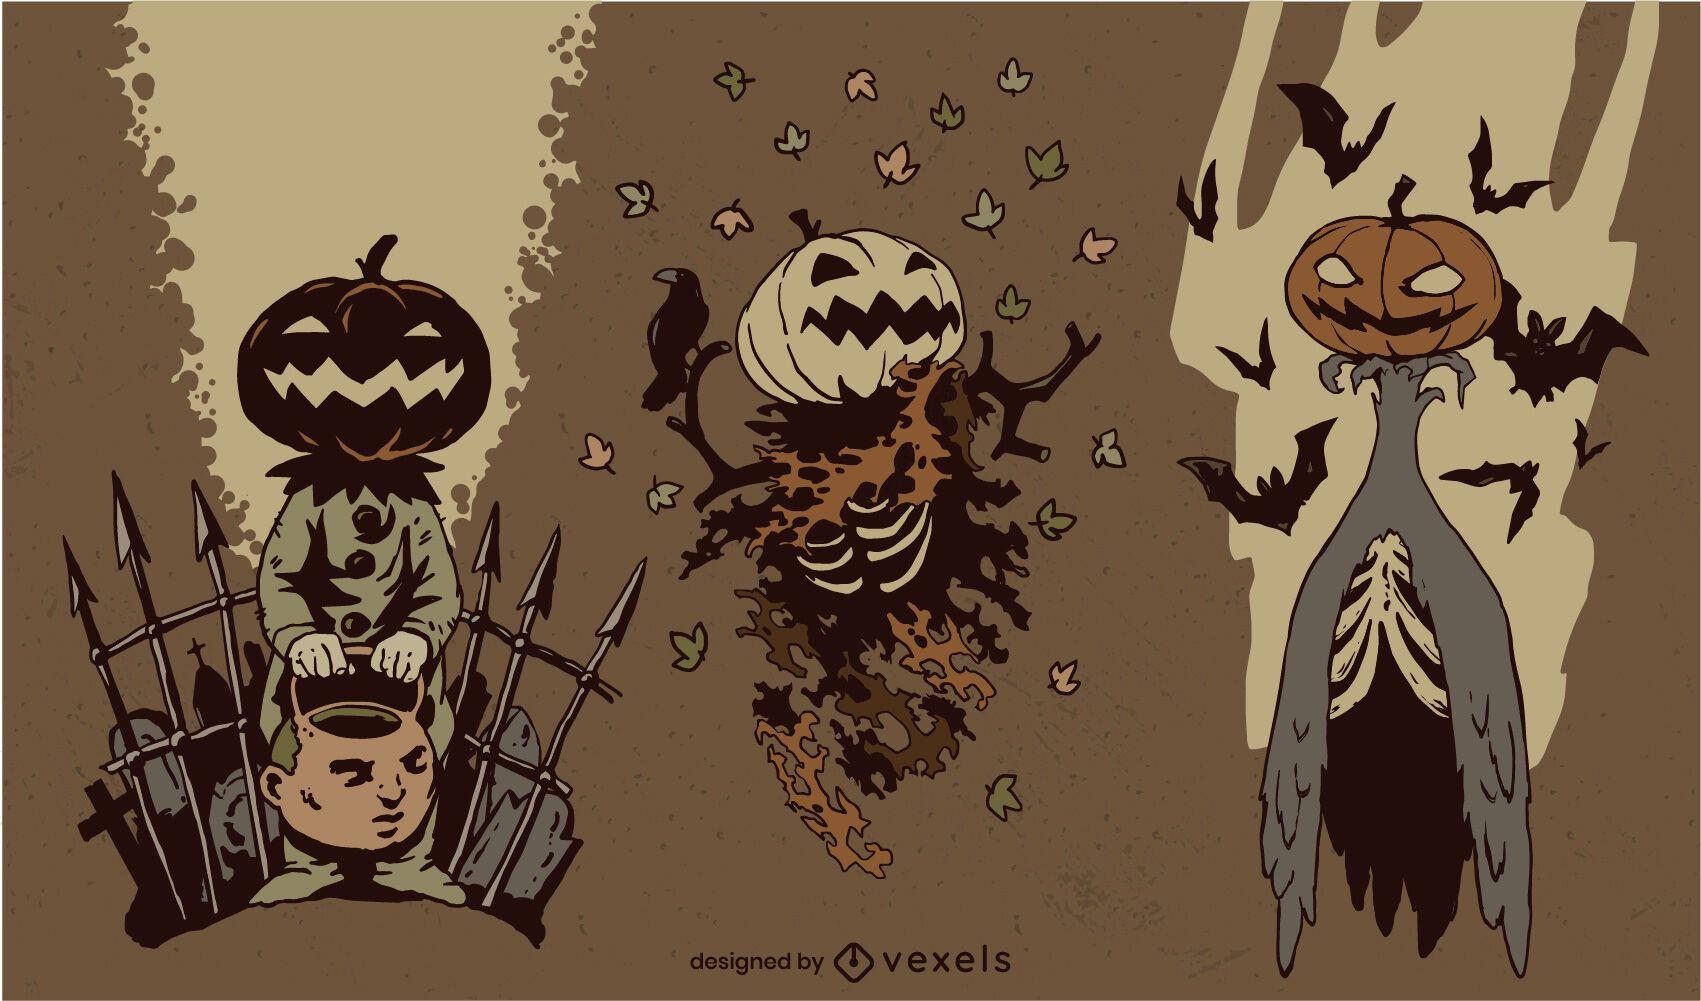 Halloween pumpkin creature character set